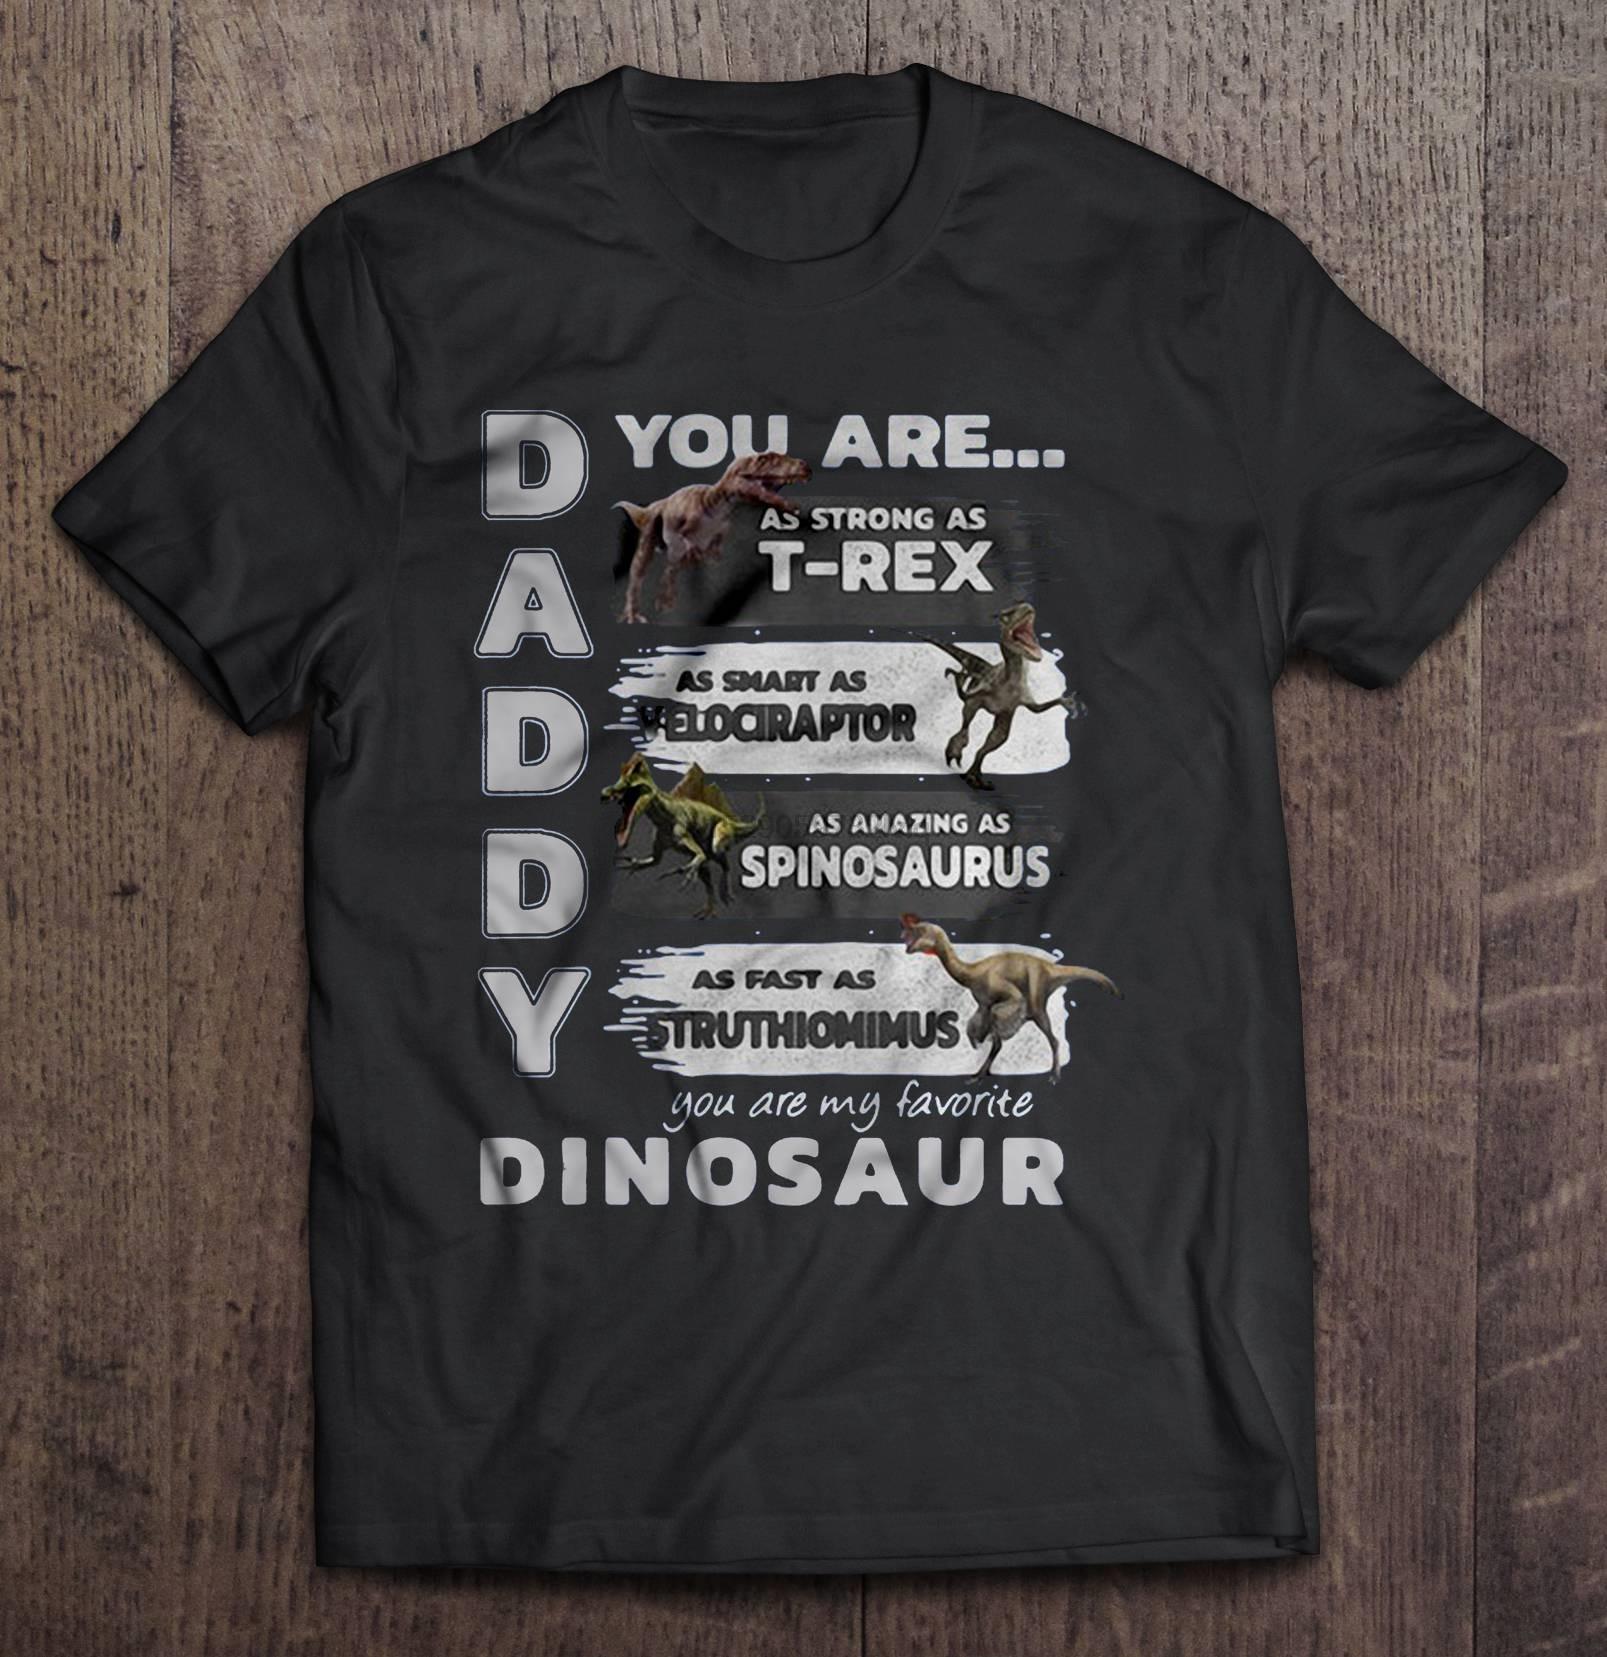 Row Row Oh T-Shirt Tyrannosaurus T-Rex Dino Dinosaur T Rex Fun Boat Ship Arms